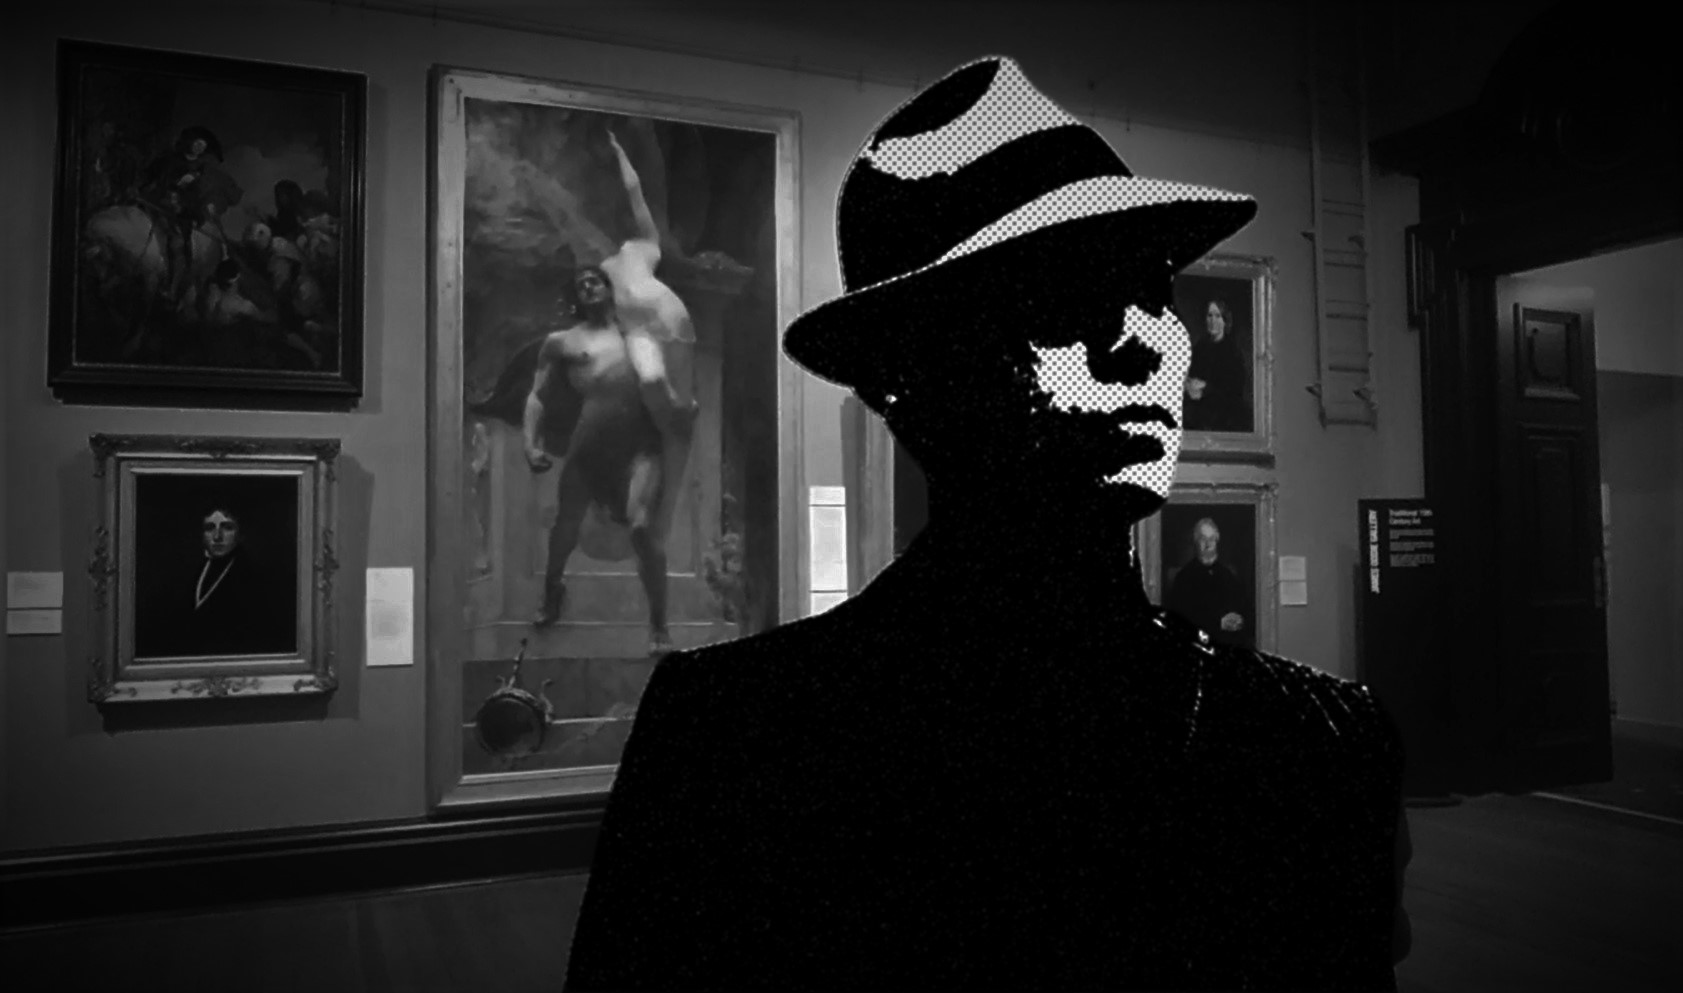 Dean Kyte at the Art Gallery of Ballarat